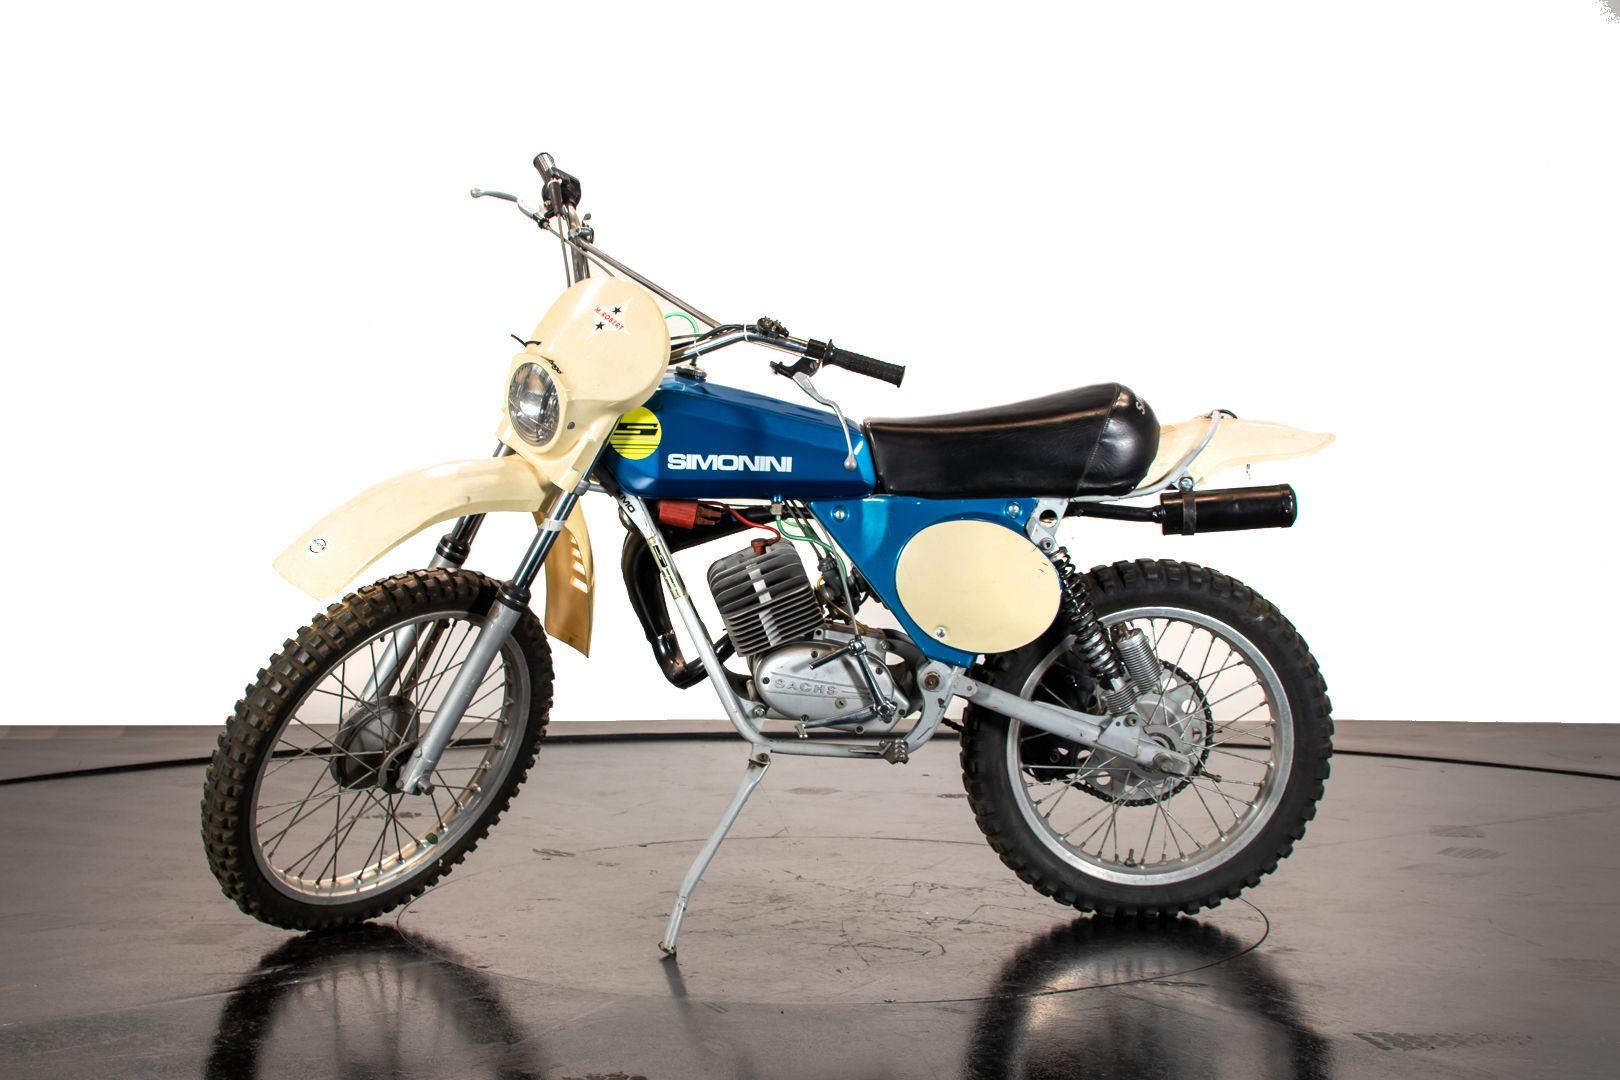 1977 Simonini S-S 61806